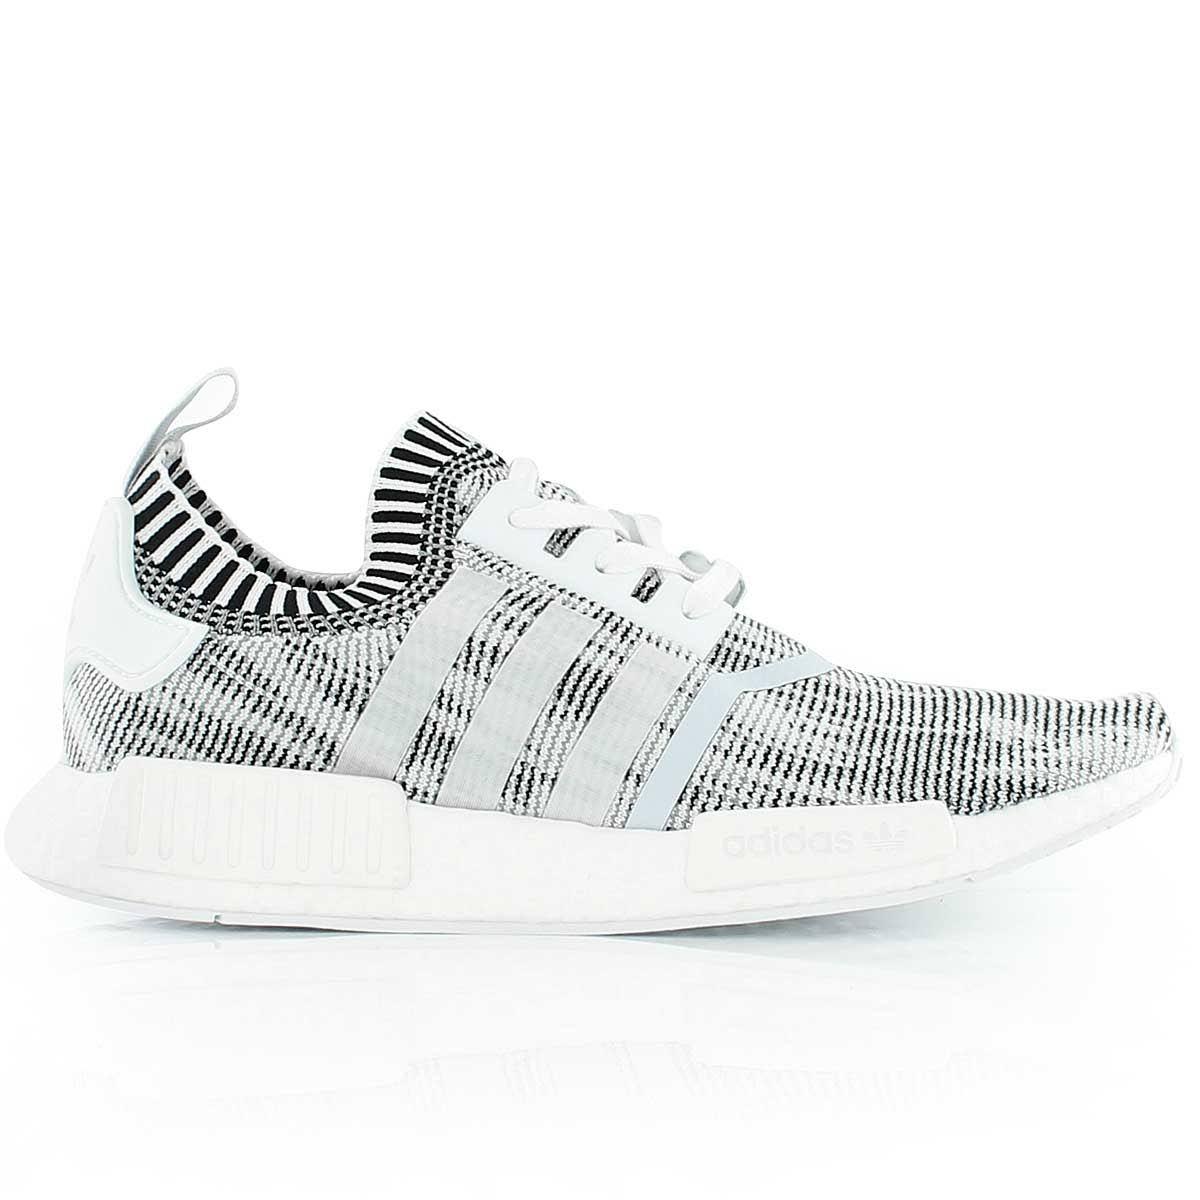 Adidas Pk Nmd R1 Bianco Nero 0OkwnP